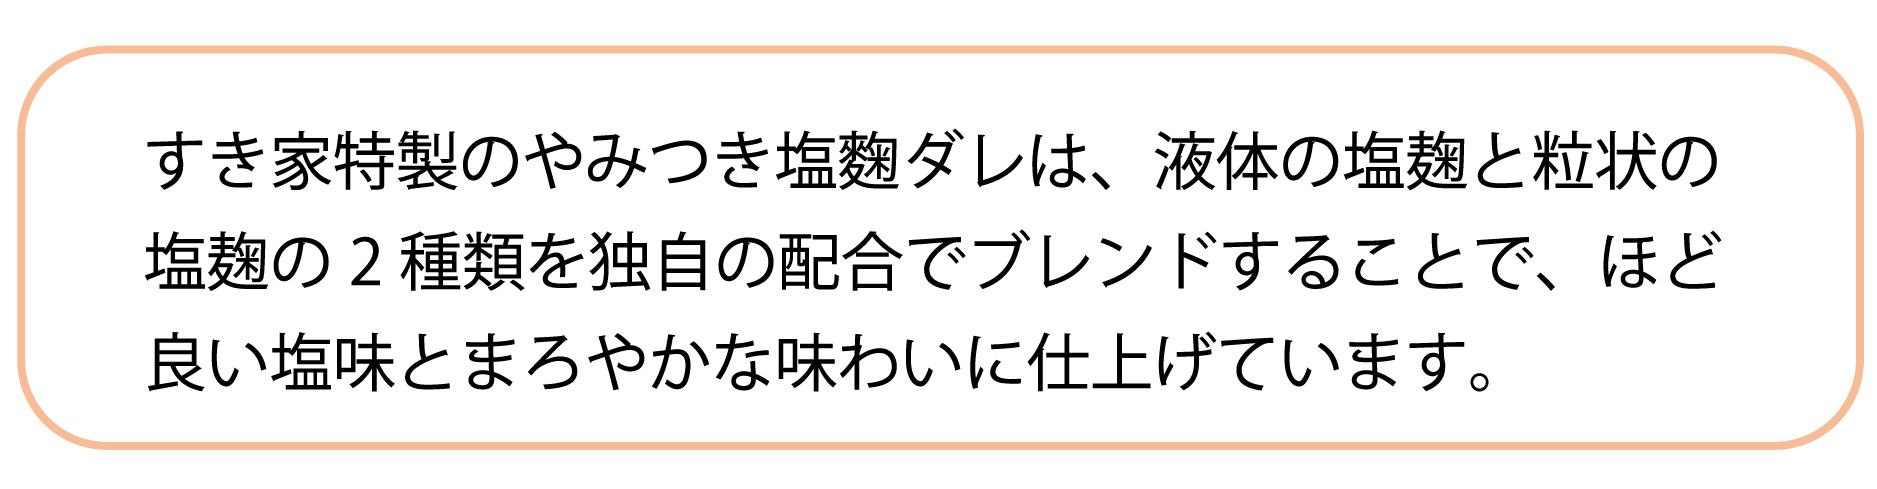 photo_20201216_siokouji.jpg